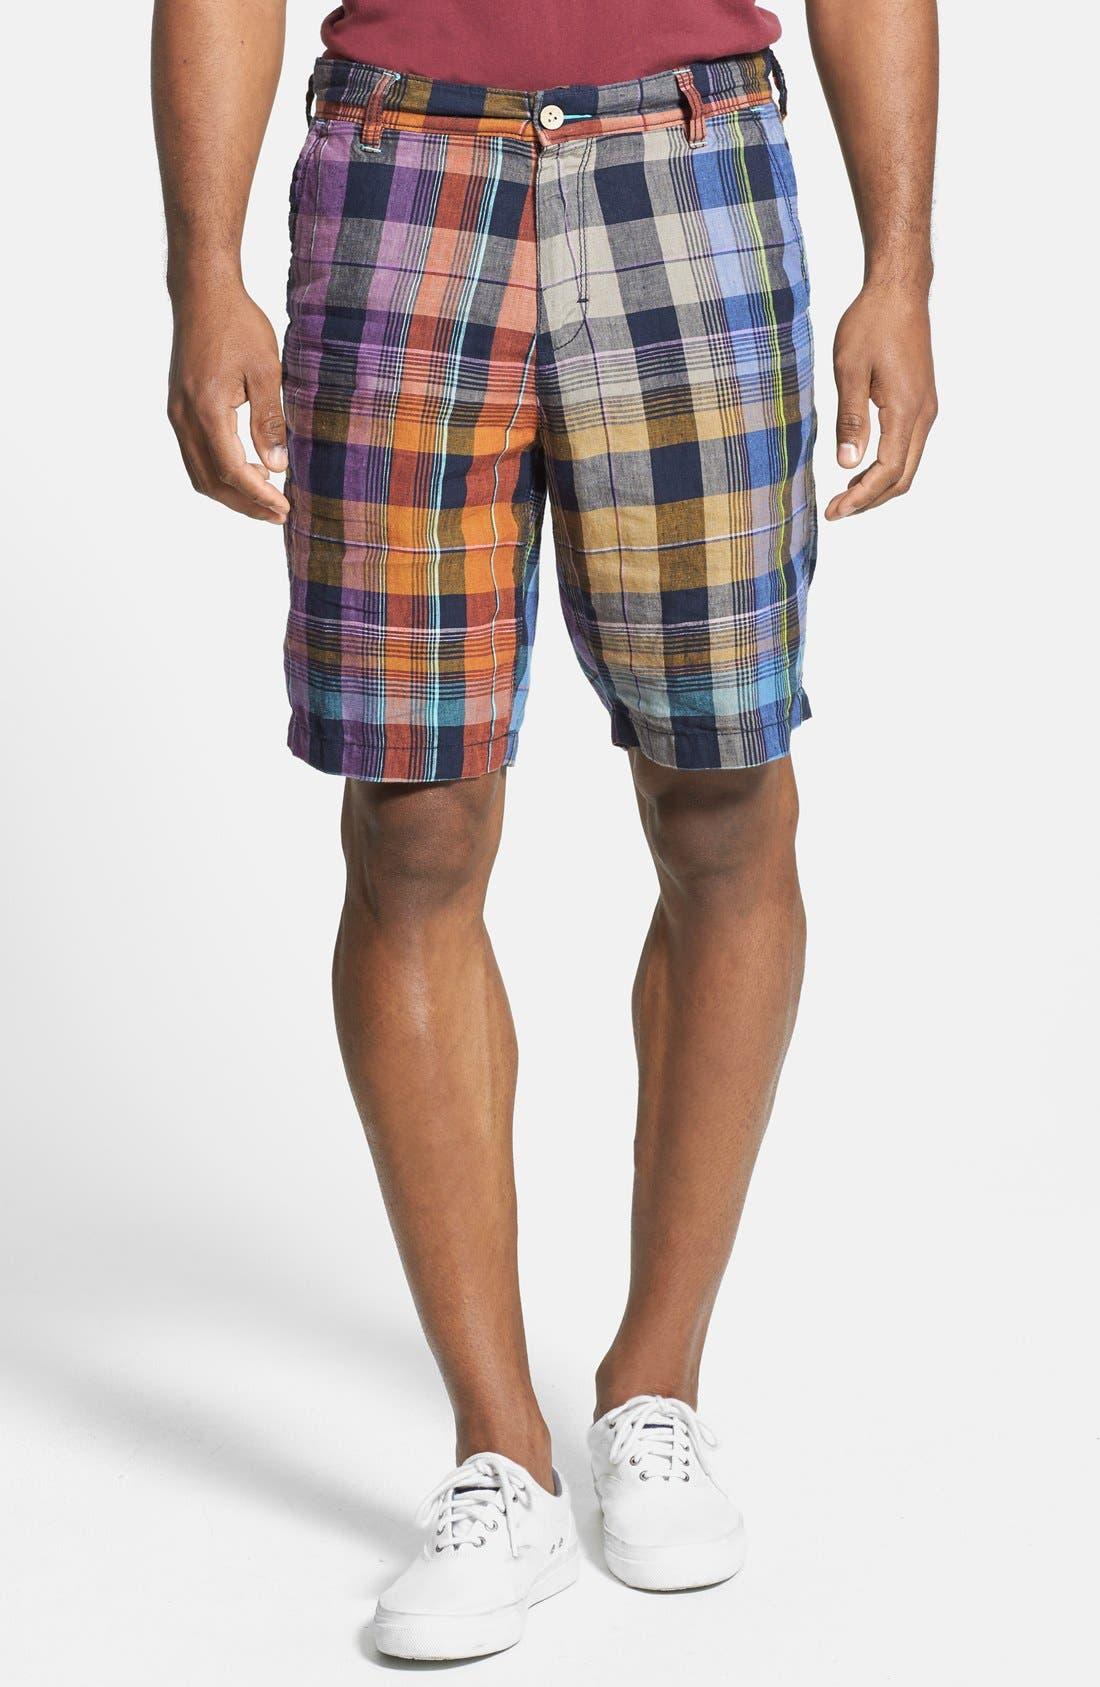 Alternate Image 1 Selected - Tommy Bahama 'Weave Master' Linen Shorts (Big)